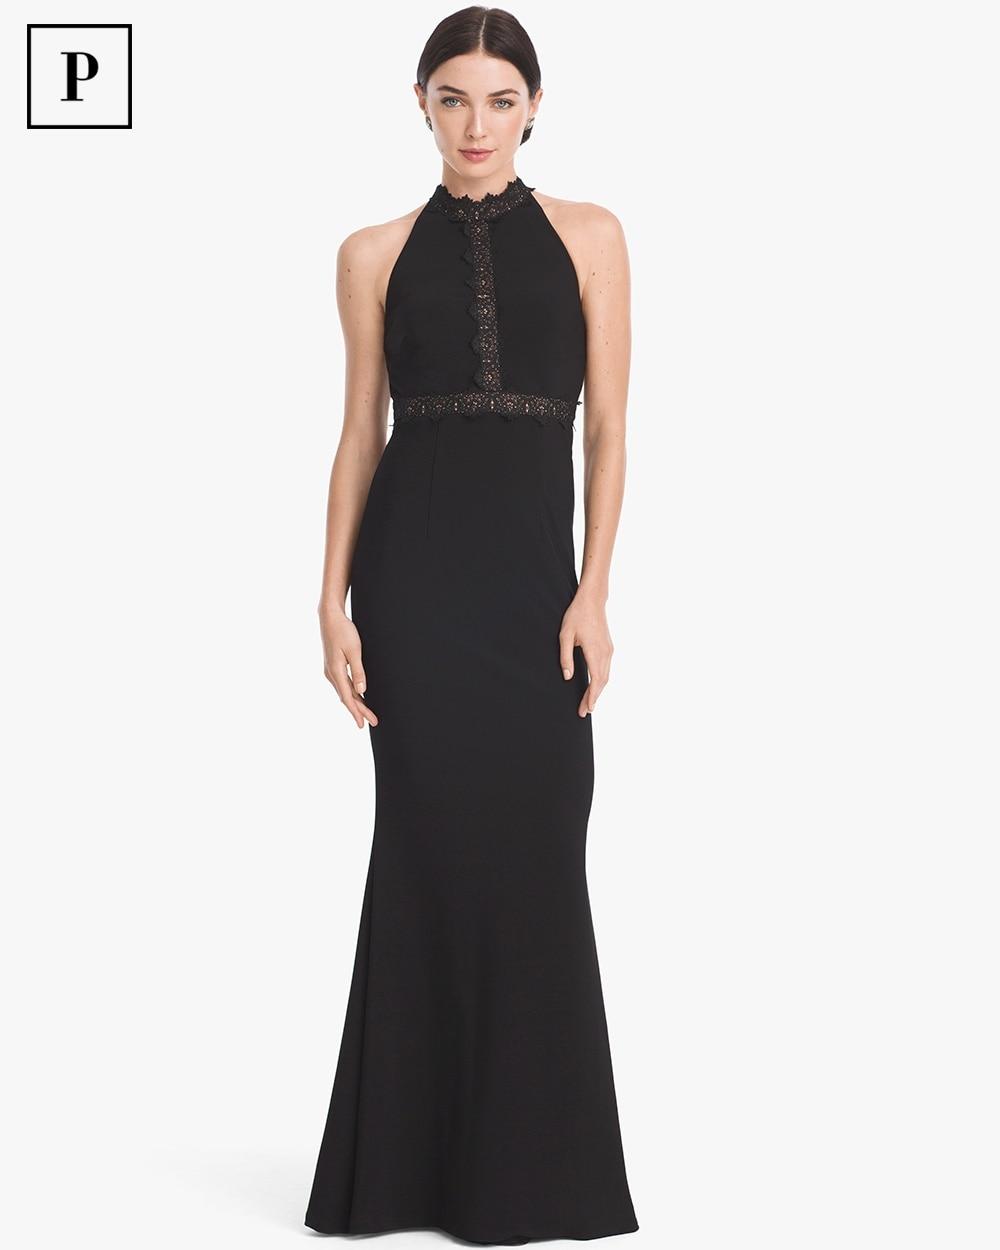 Petite Black Lace Inset T-Back Gown - White House Black Market